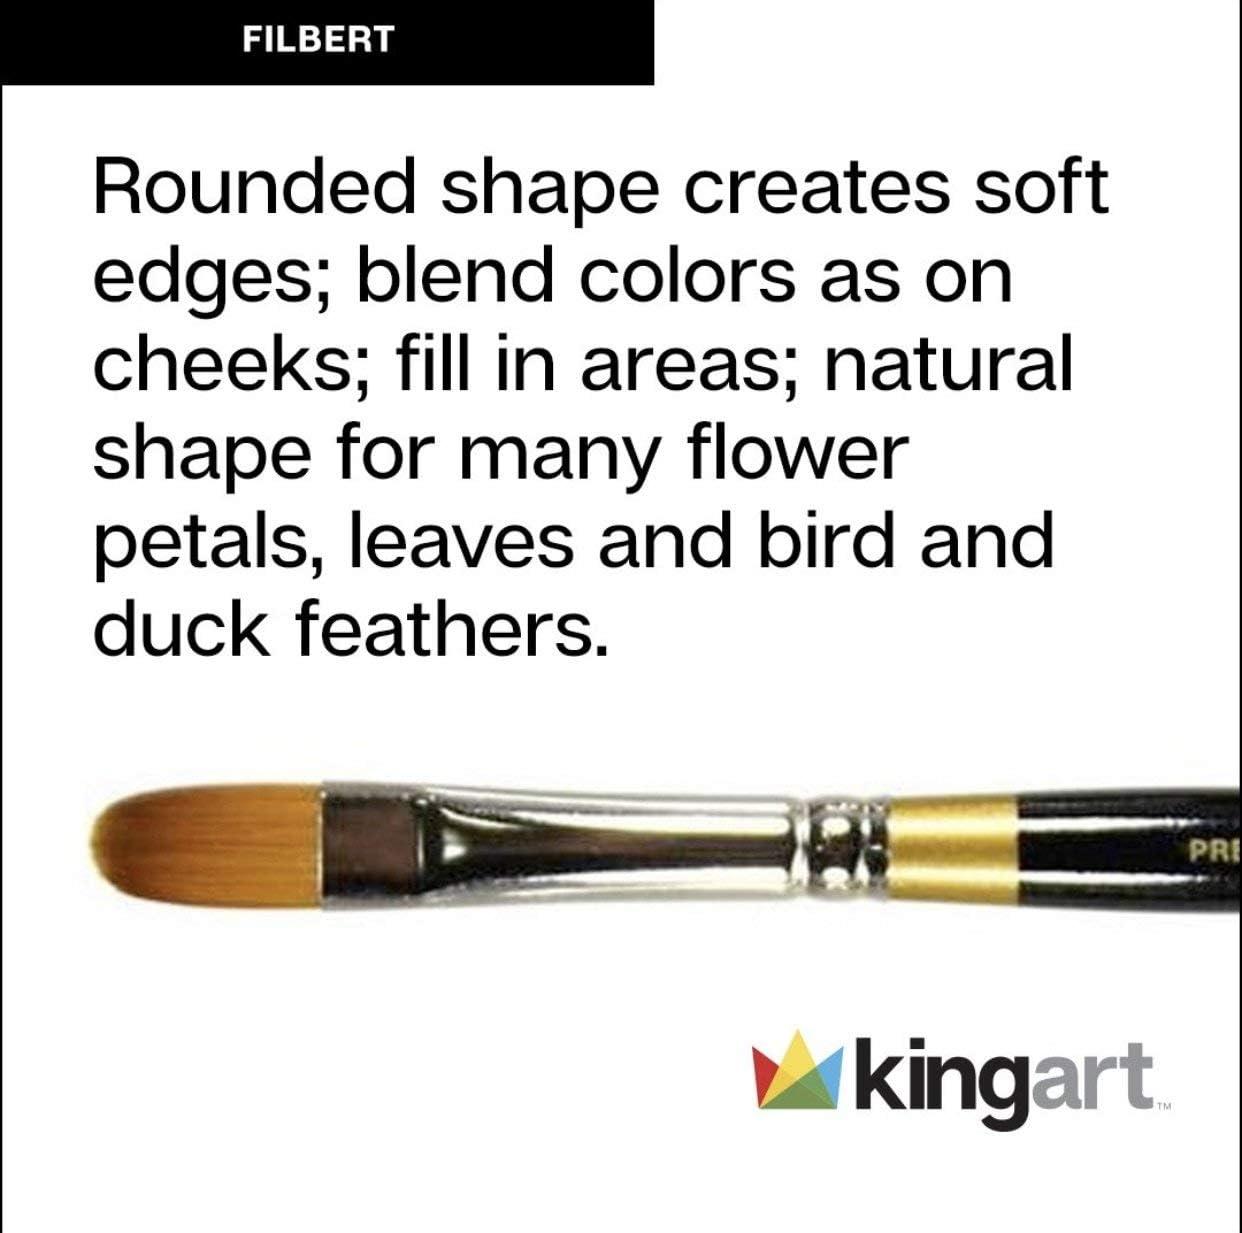 KingArt 9500-14 Original Gold 9500 Series Premium Artist Brush 14